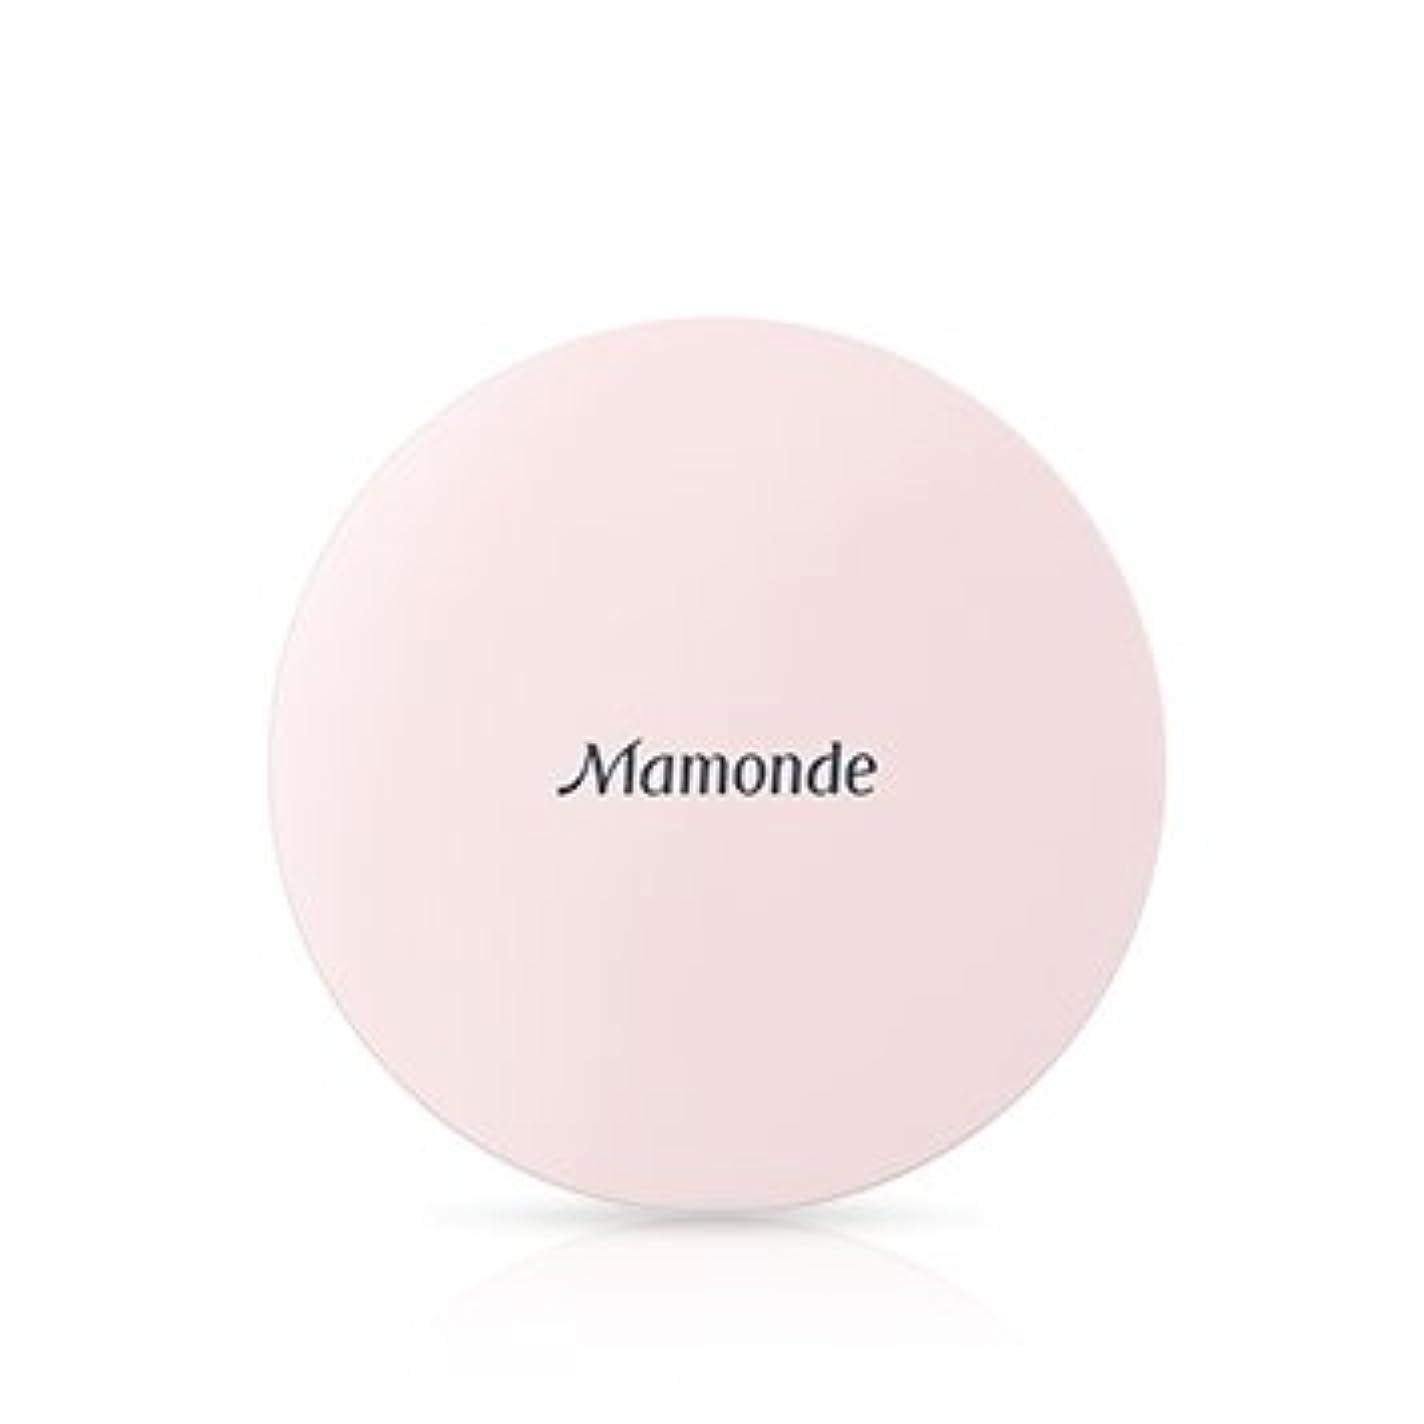 [New] Mamonde High Cover Liquid Cushion 15g/マモンド ハイ カバー リキッド クッション 15g (#23 Cover Sand) [並行輸入品]